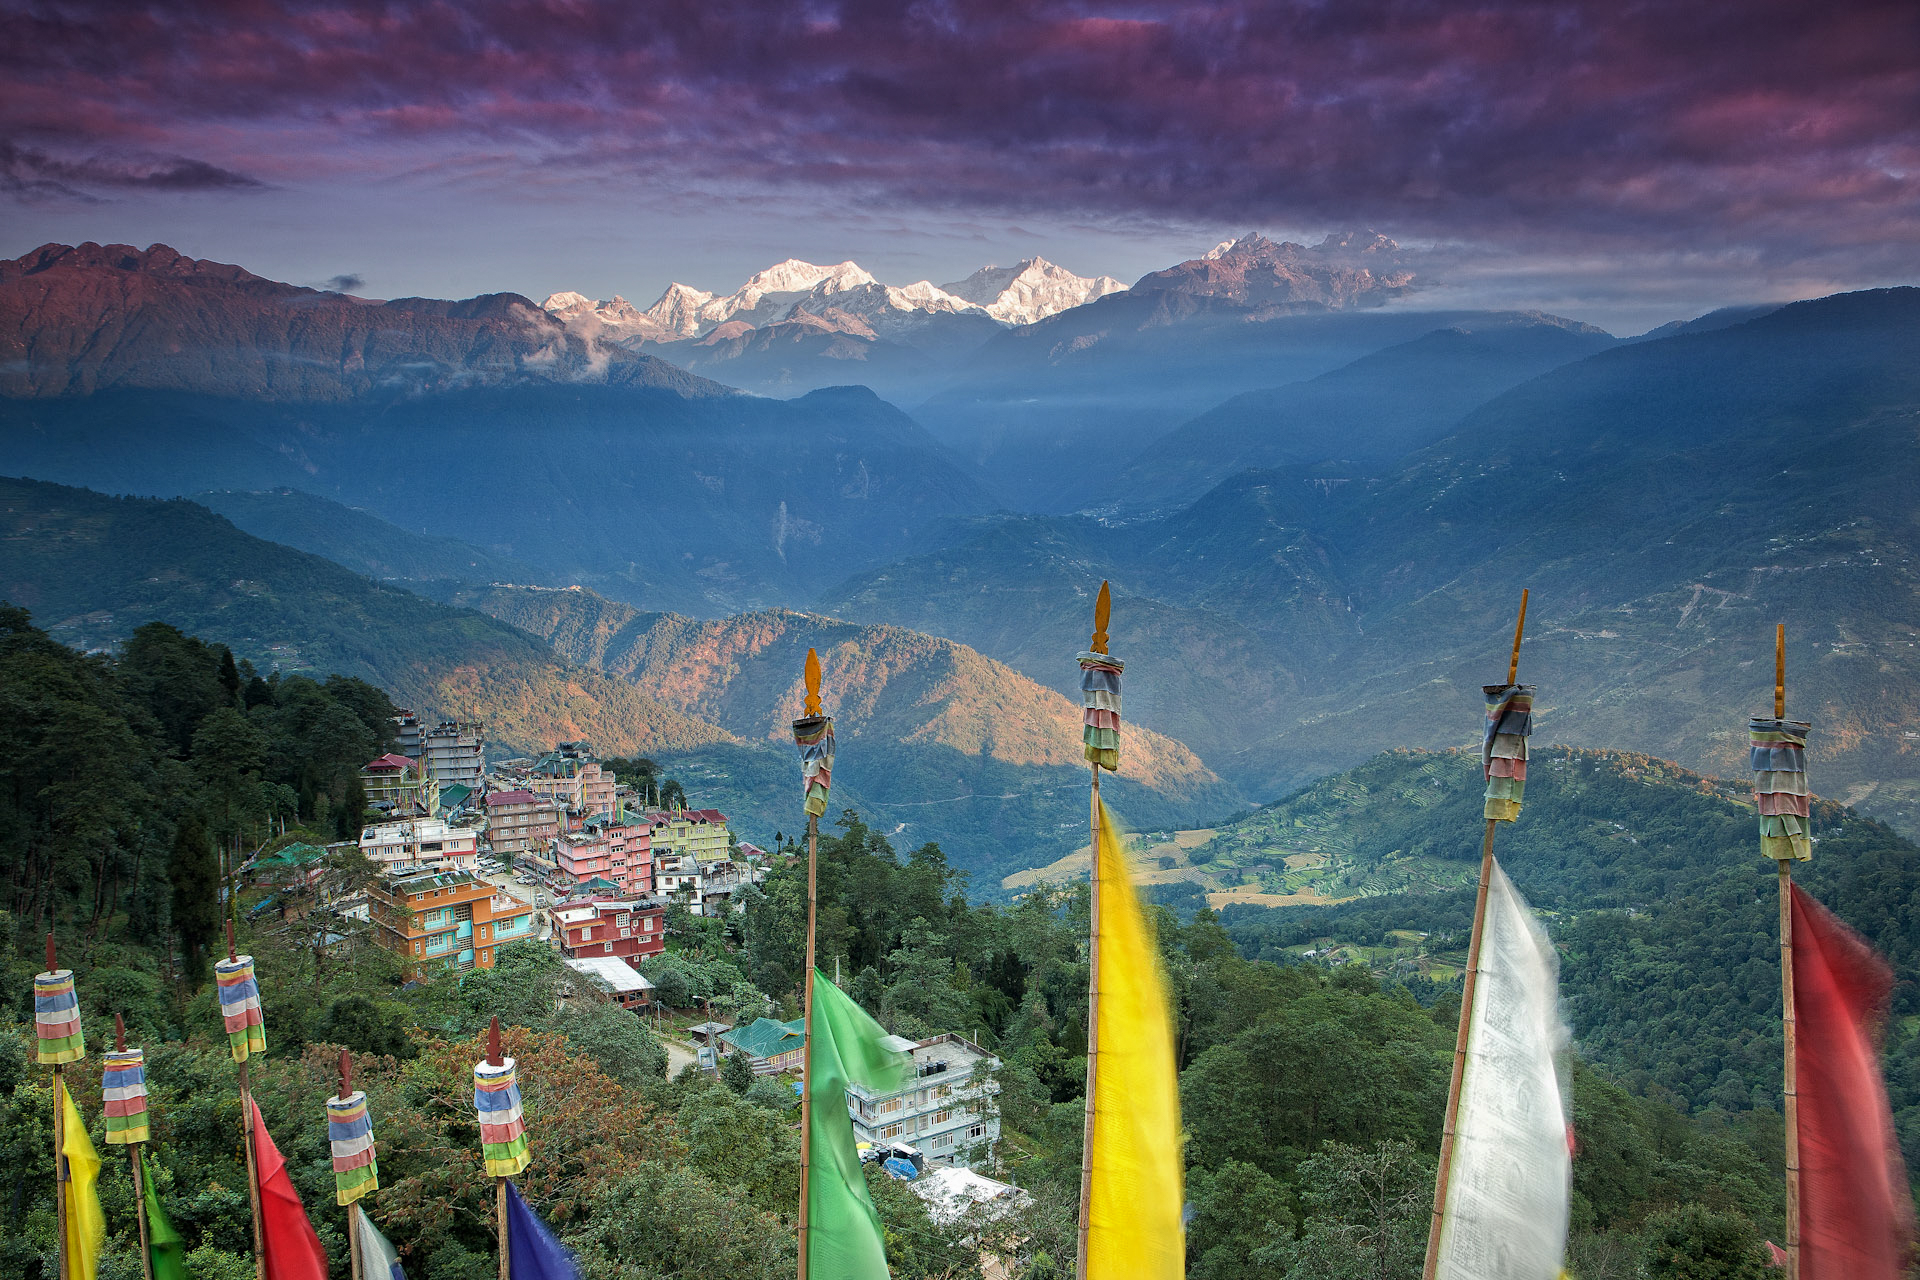 Jason_Bax_Travel_India-Sikkim-Pelling-Kanchenjunga.JPG